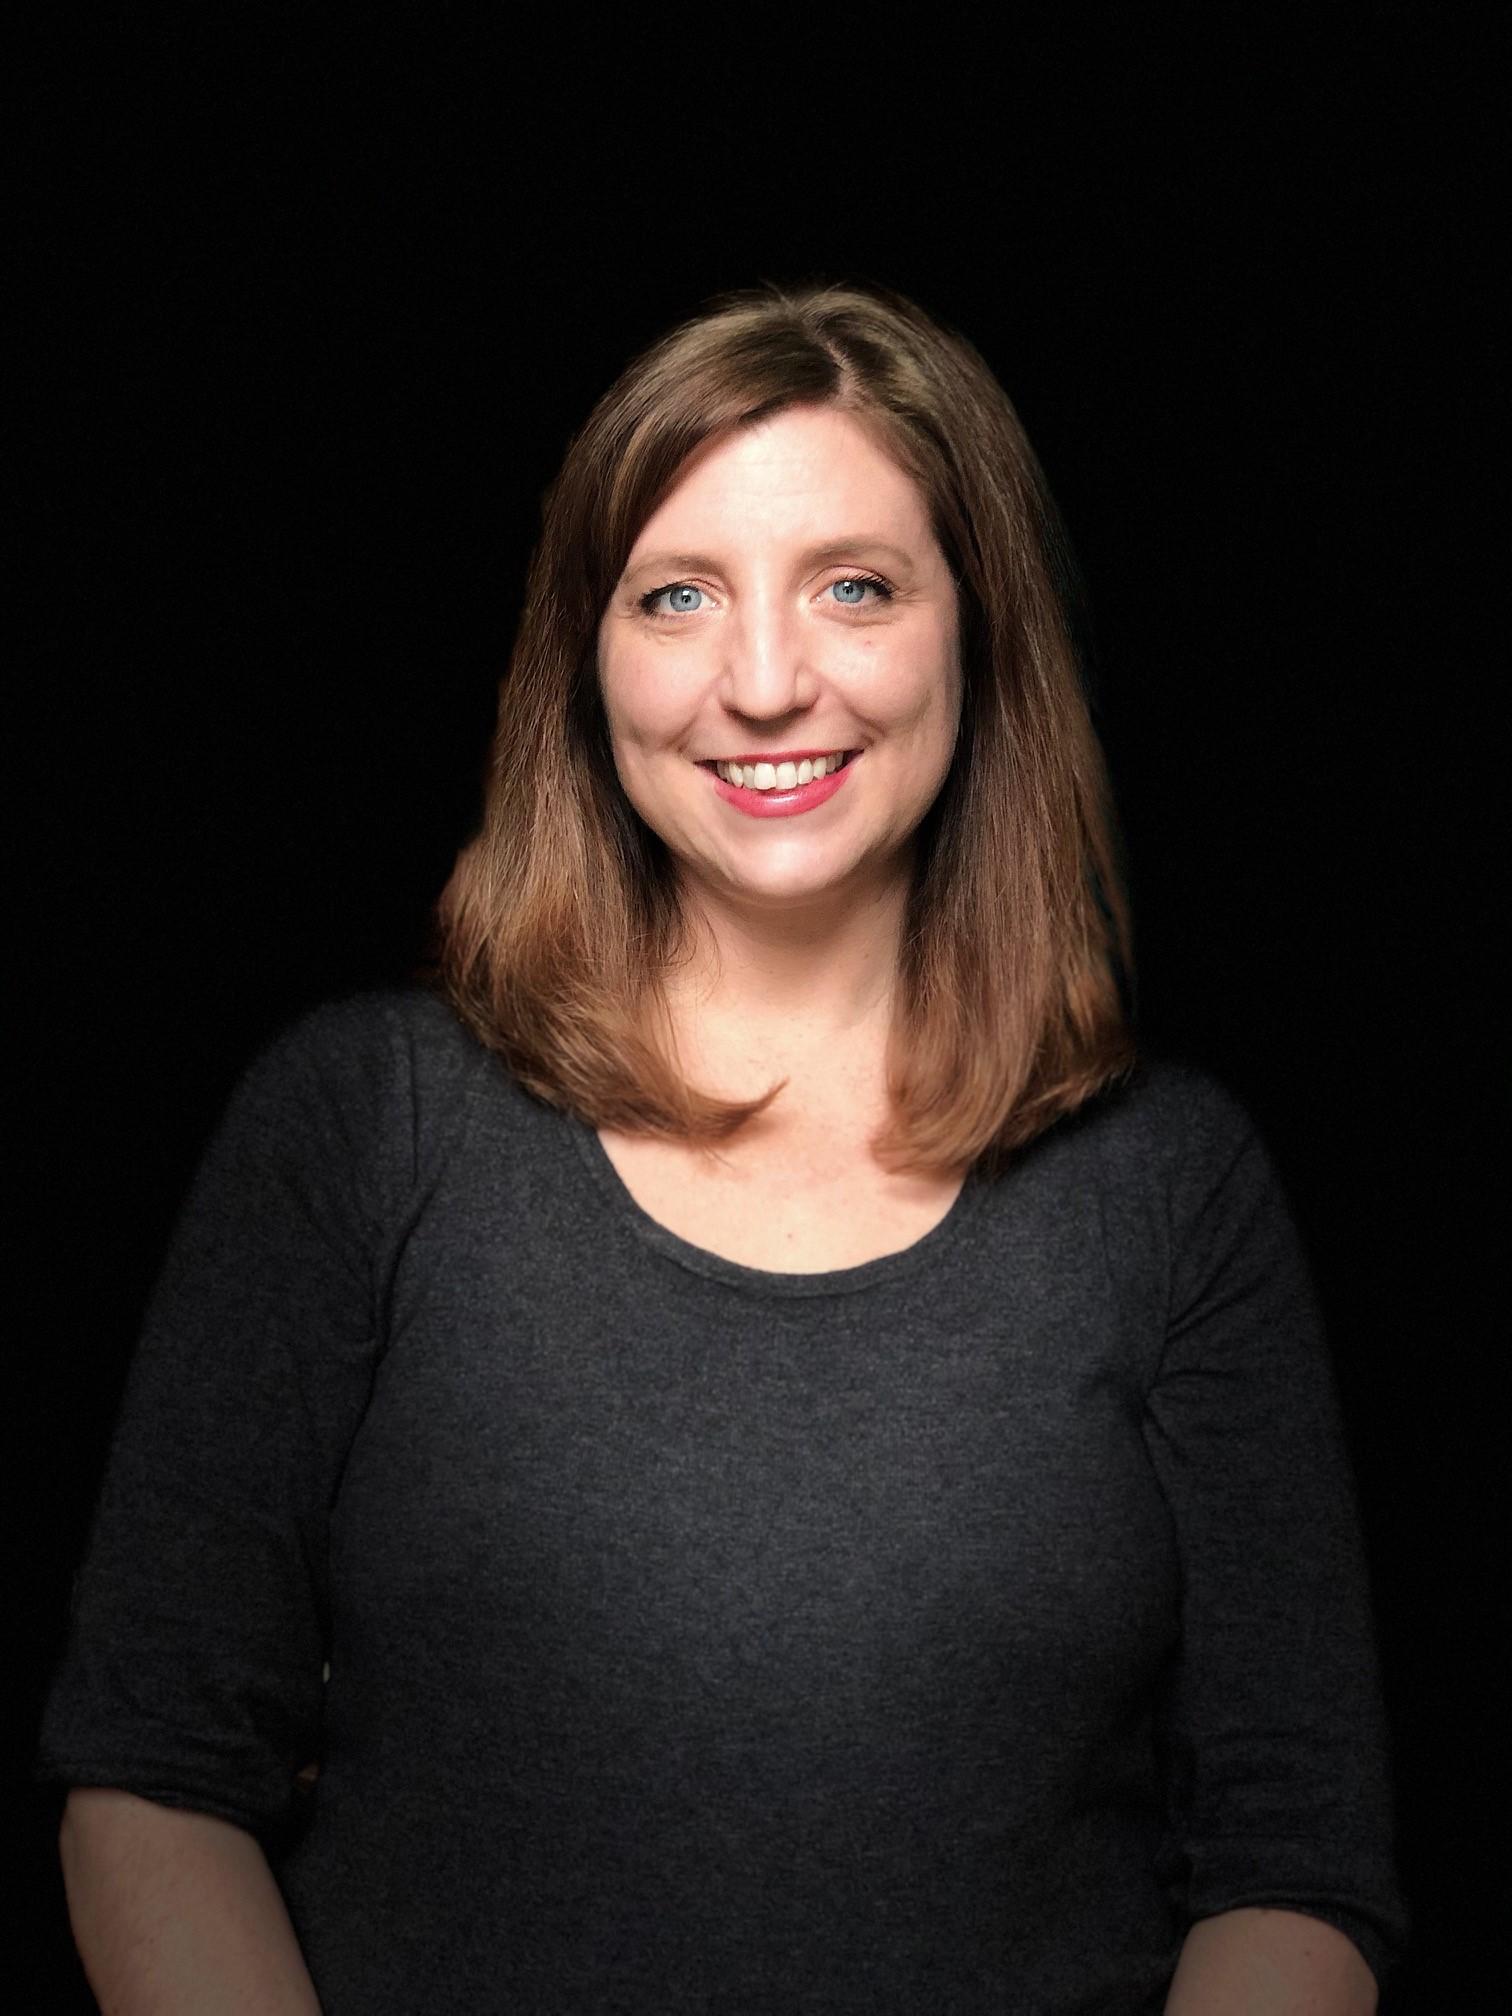 Sarah Paradoski - Director of Program Developmentsarah@irwpstl.org